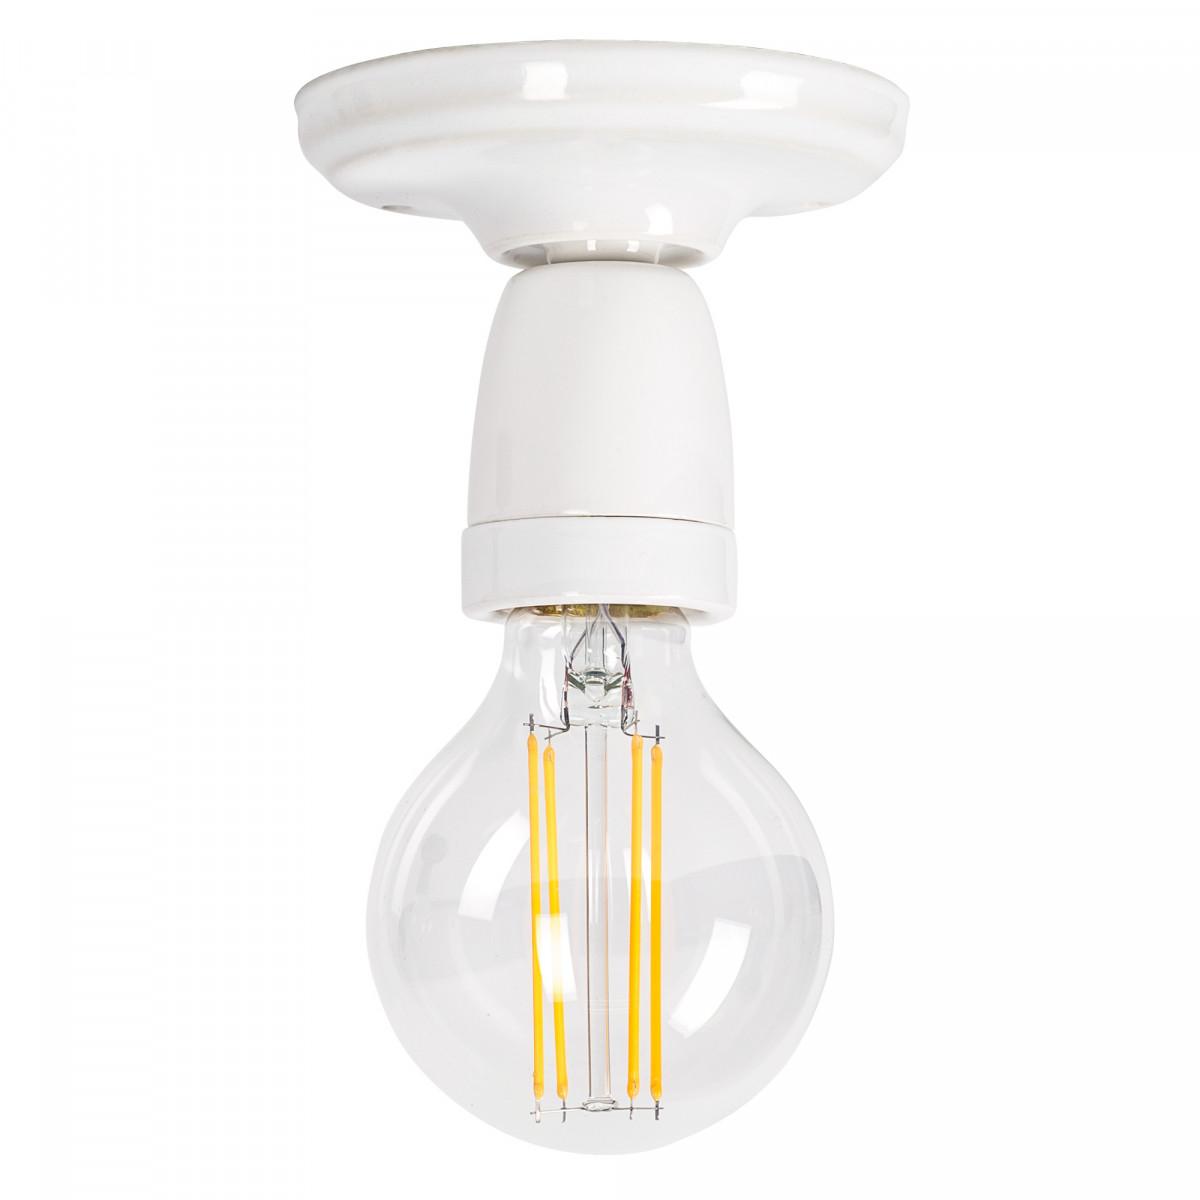 Retro plafondlamp Mir wit